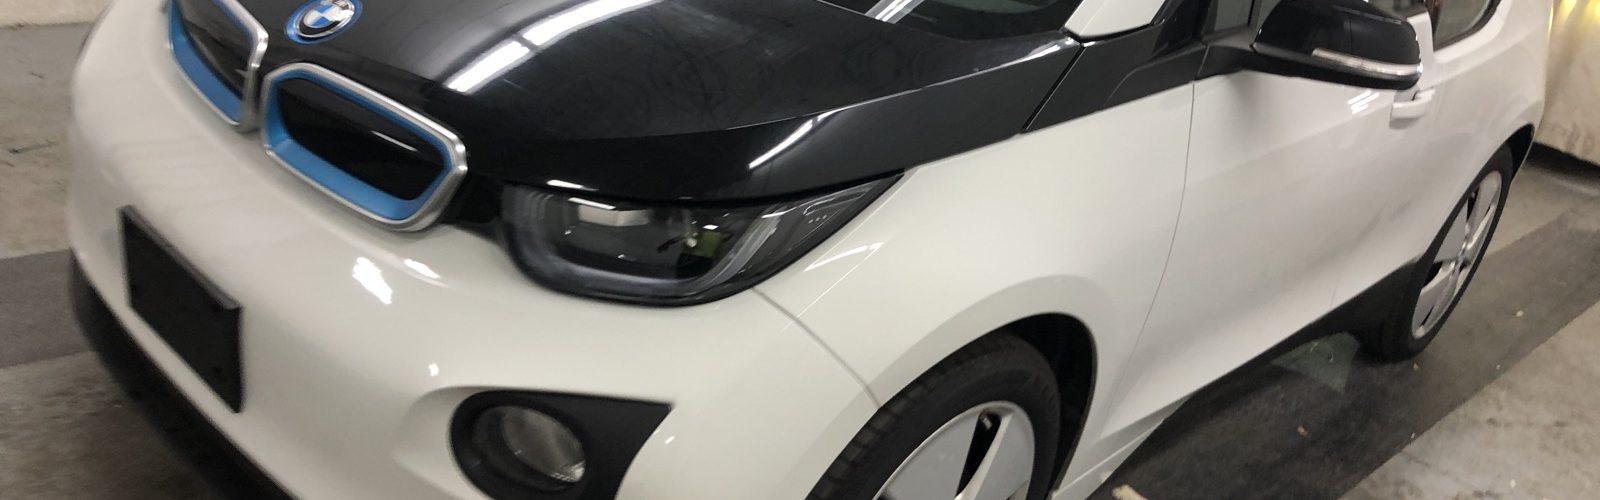 BMW i3 DEKA  2017 – 19 500  Km – Seulement 22 500 $ – DISPONIBLE